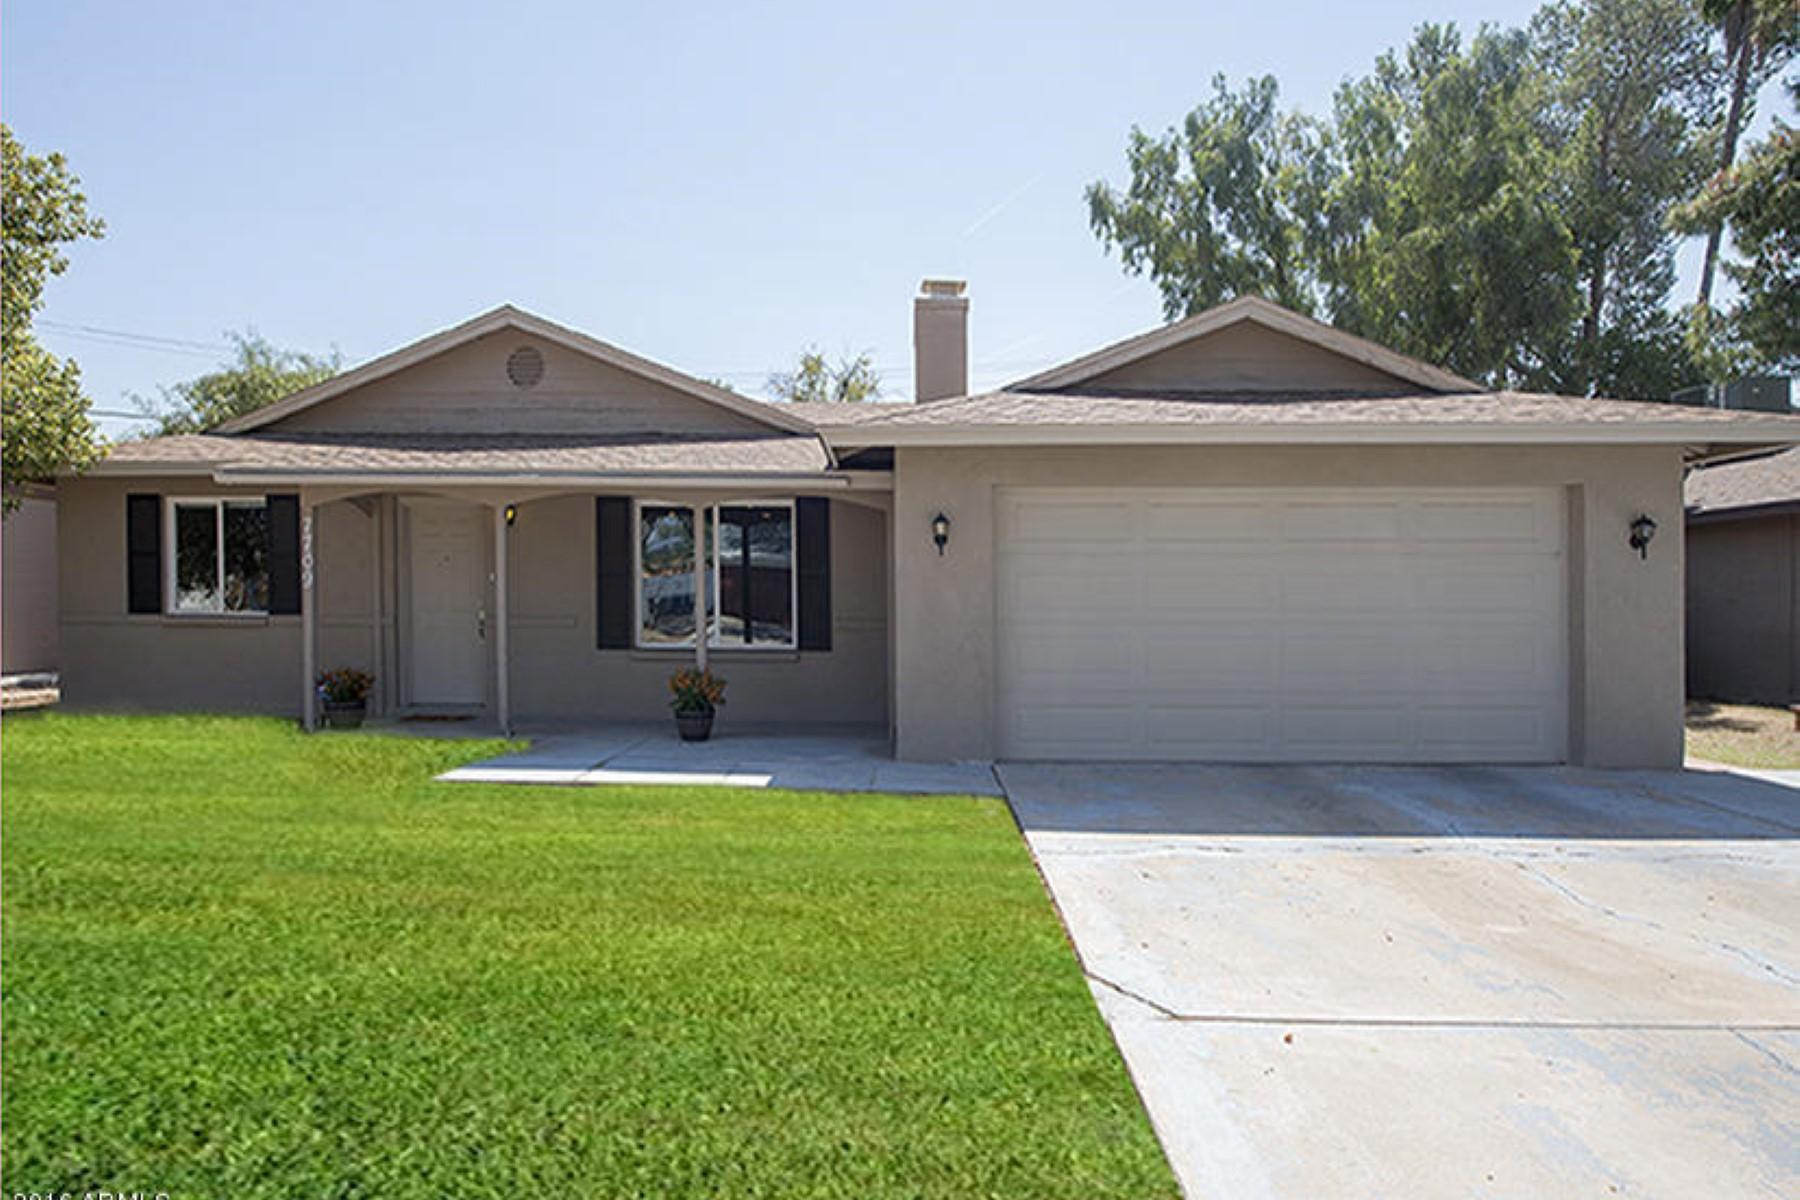 独户住宅 为 销售 在 Lovely single level home in a great neighborhood 7709 N 18th Ave 菲尼克斯(凤凰城), 亚利桑那州, 85021 美国